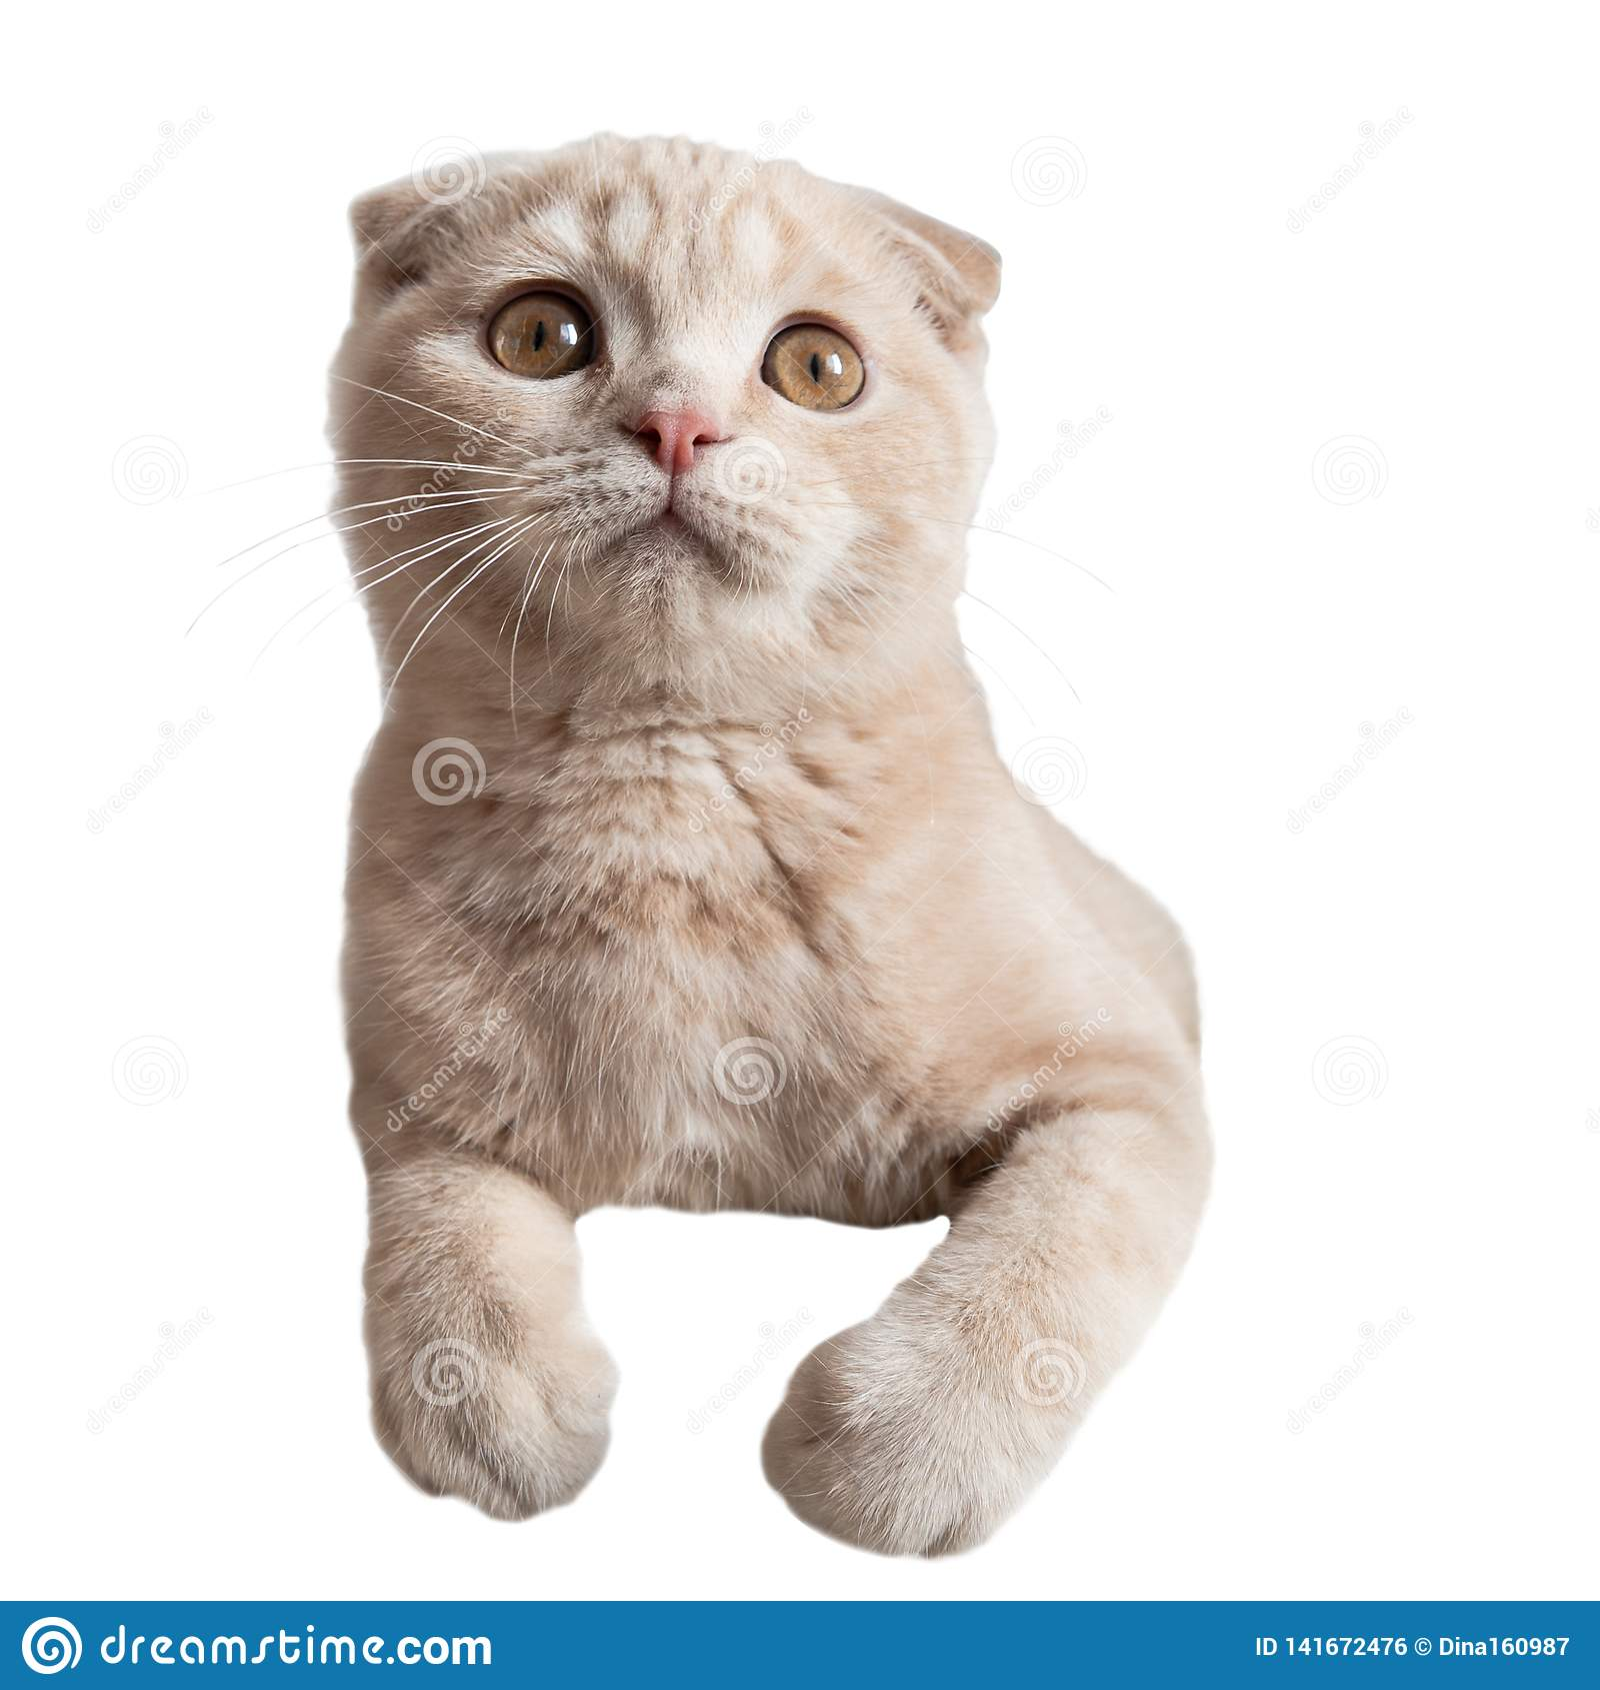 Cat with big surprised eyes  on white background. Crazy cat. Scottish fold kitten